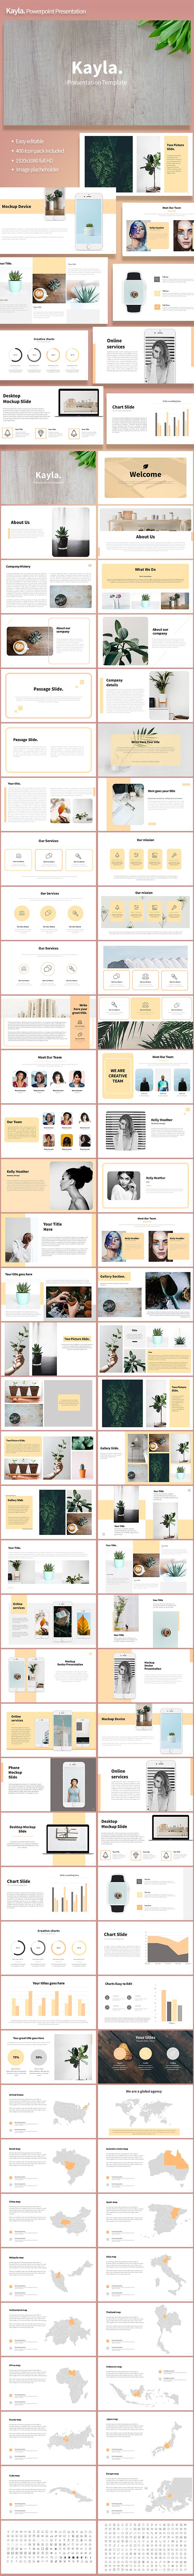 Kayla Presentation Template - PowerPoint Templates Presentation Templates